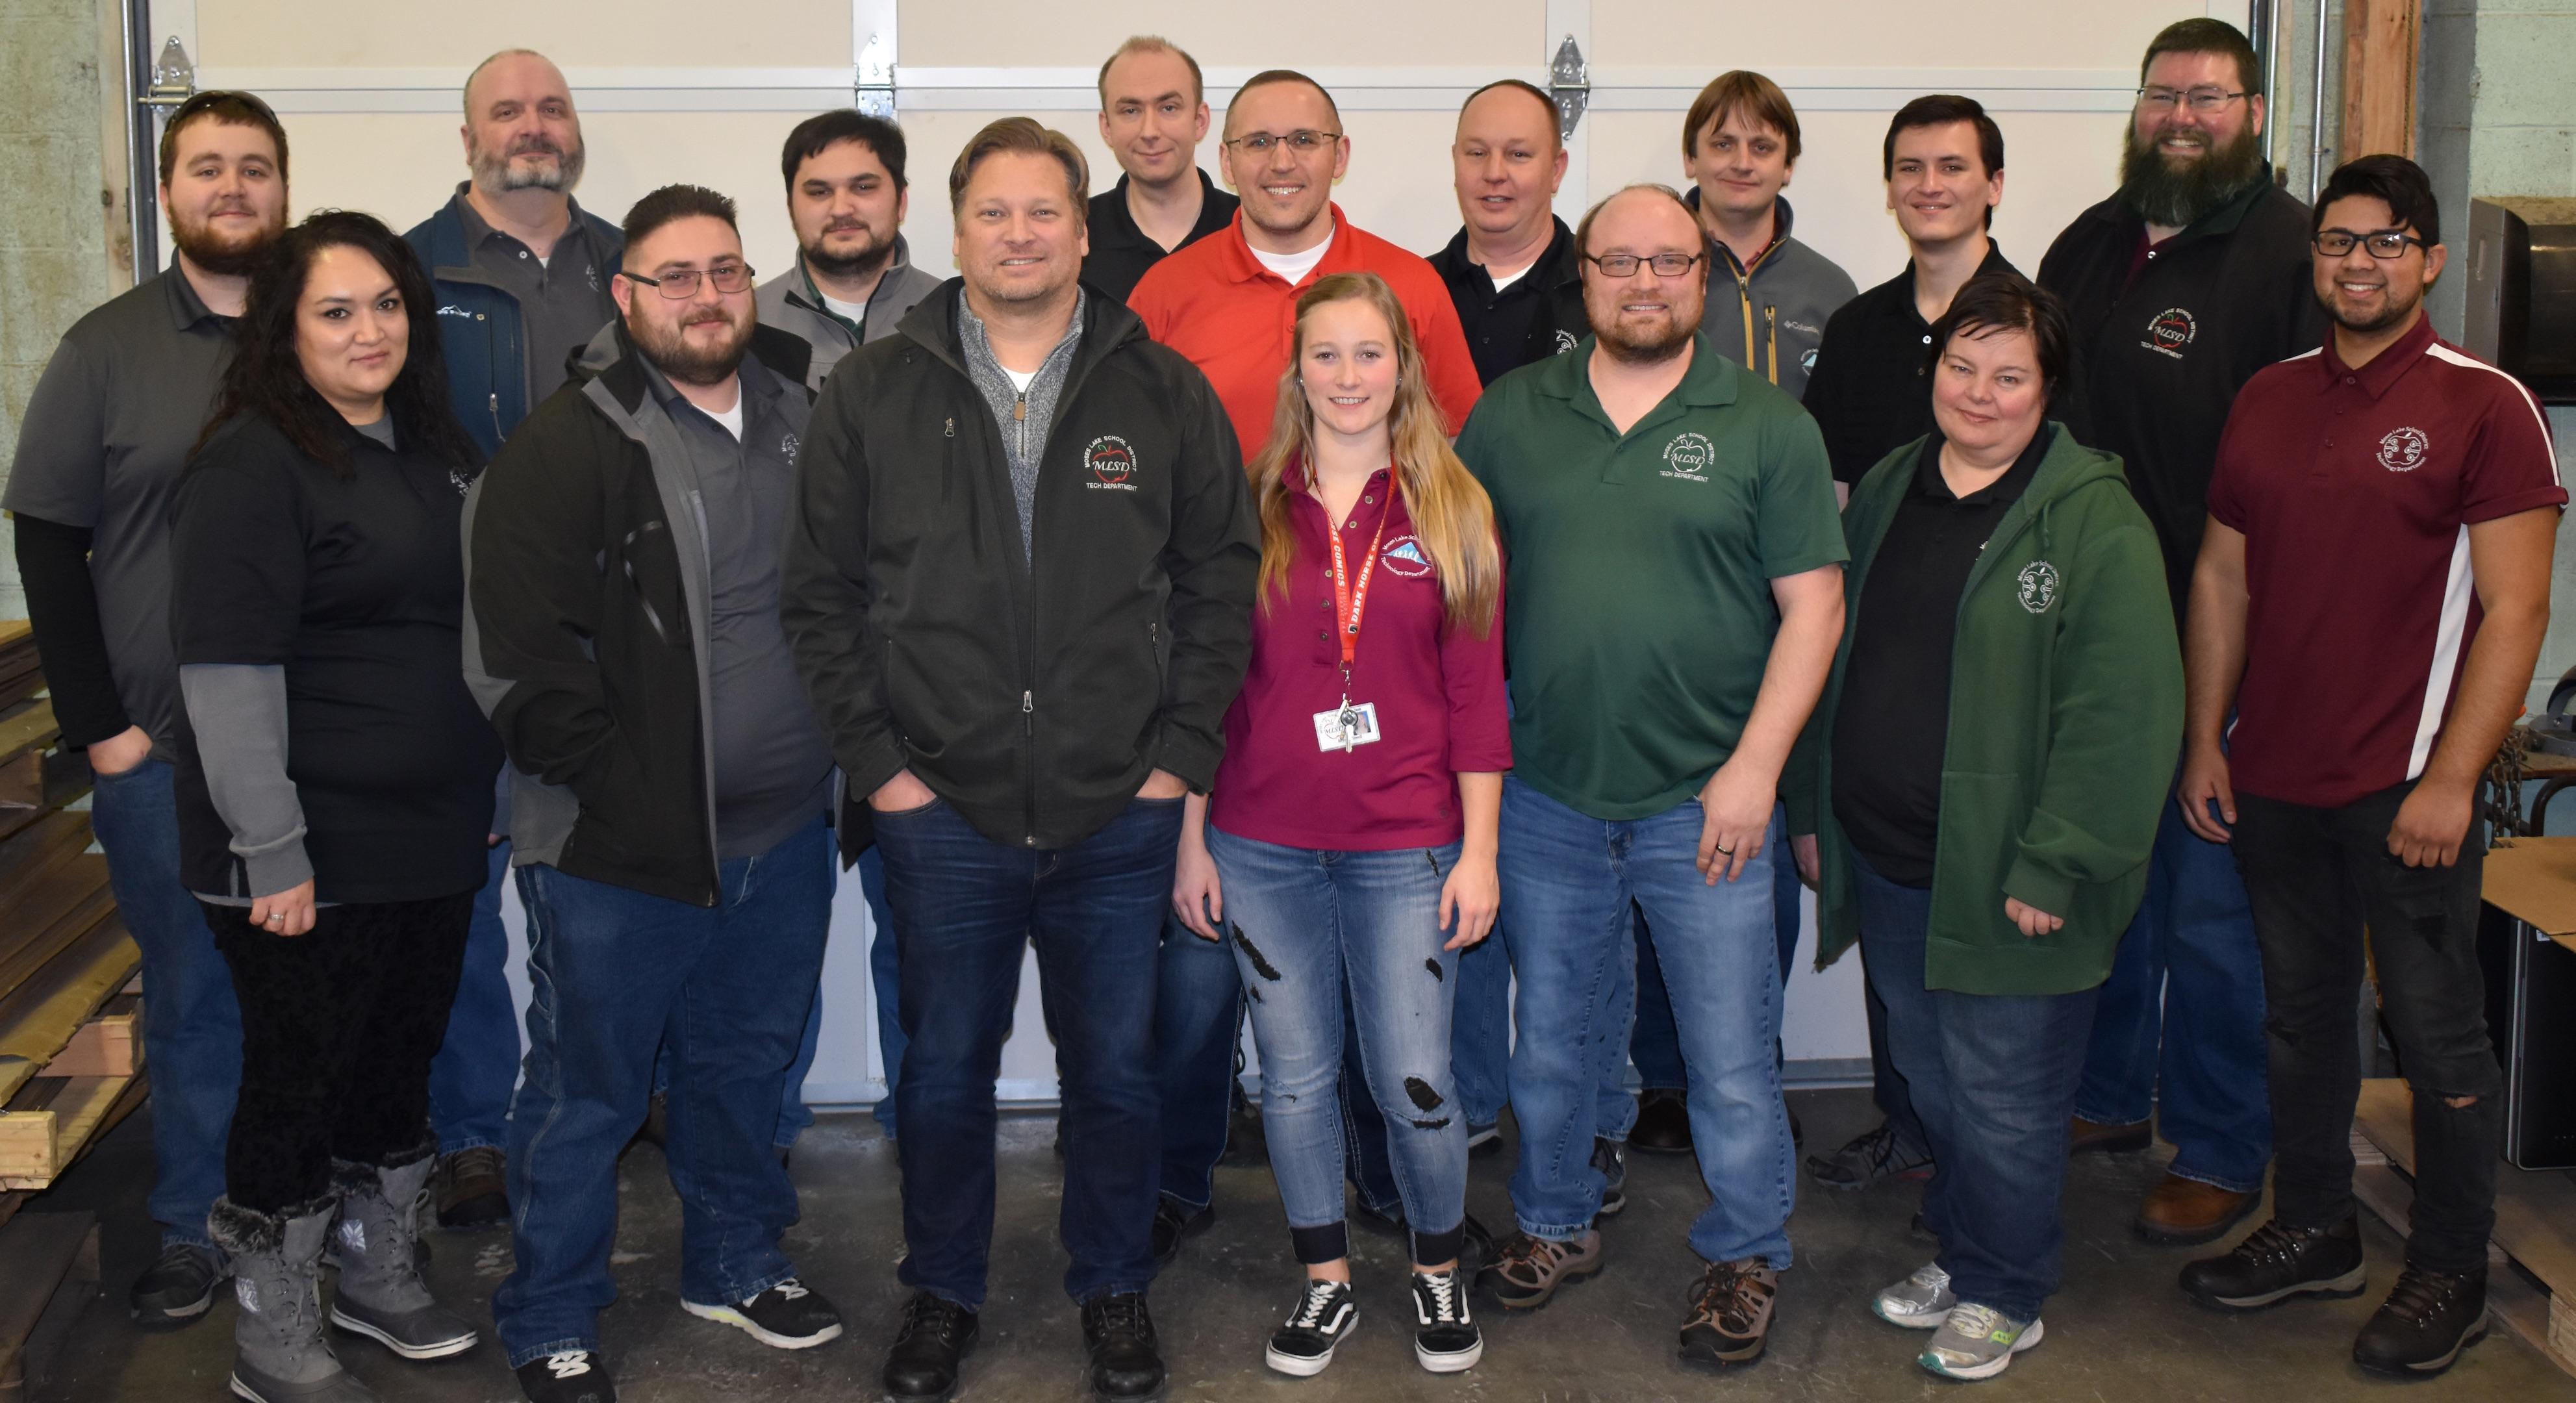 MLSD Tech Department staff photo